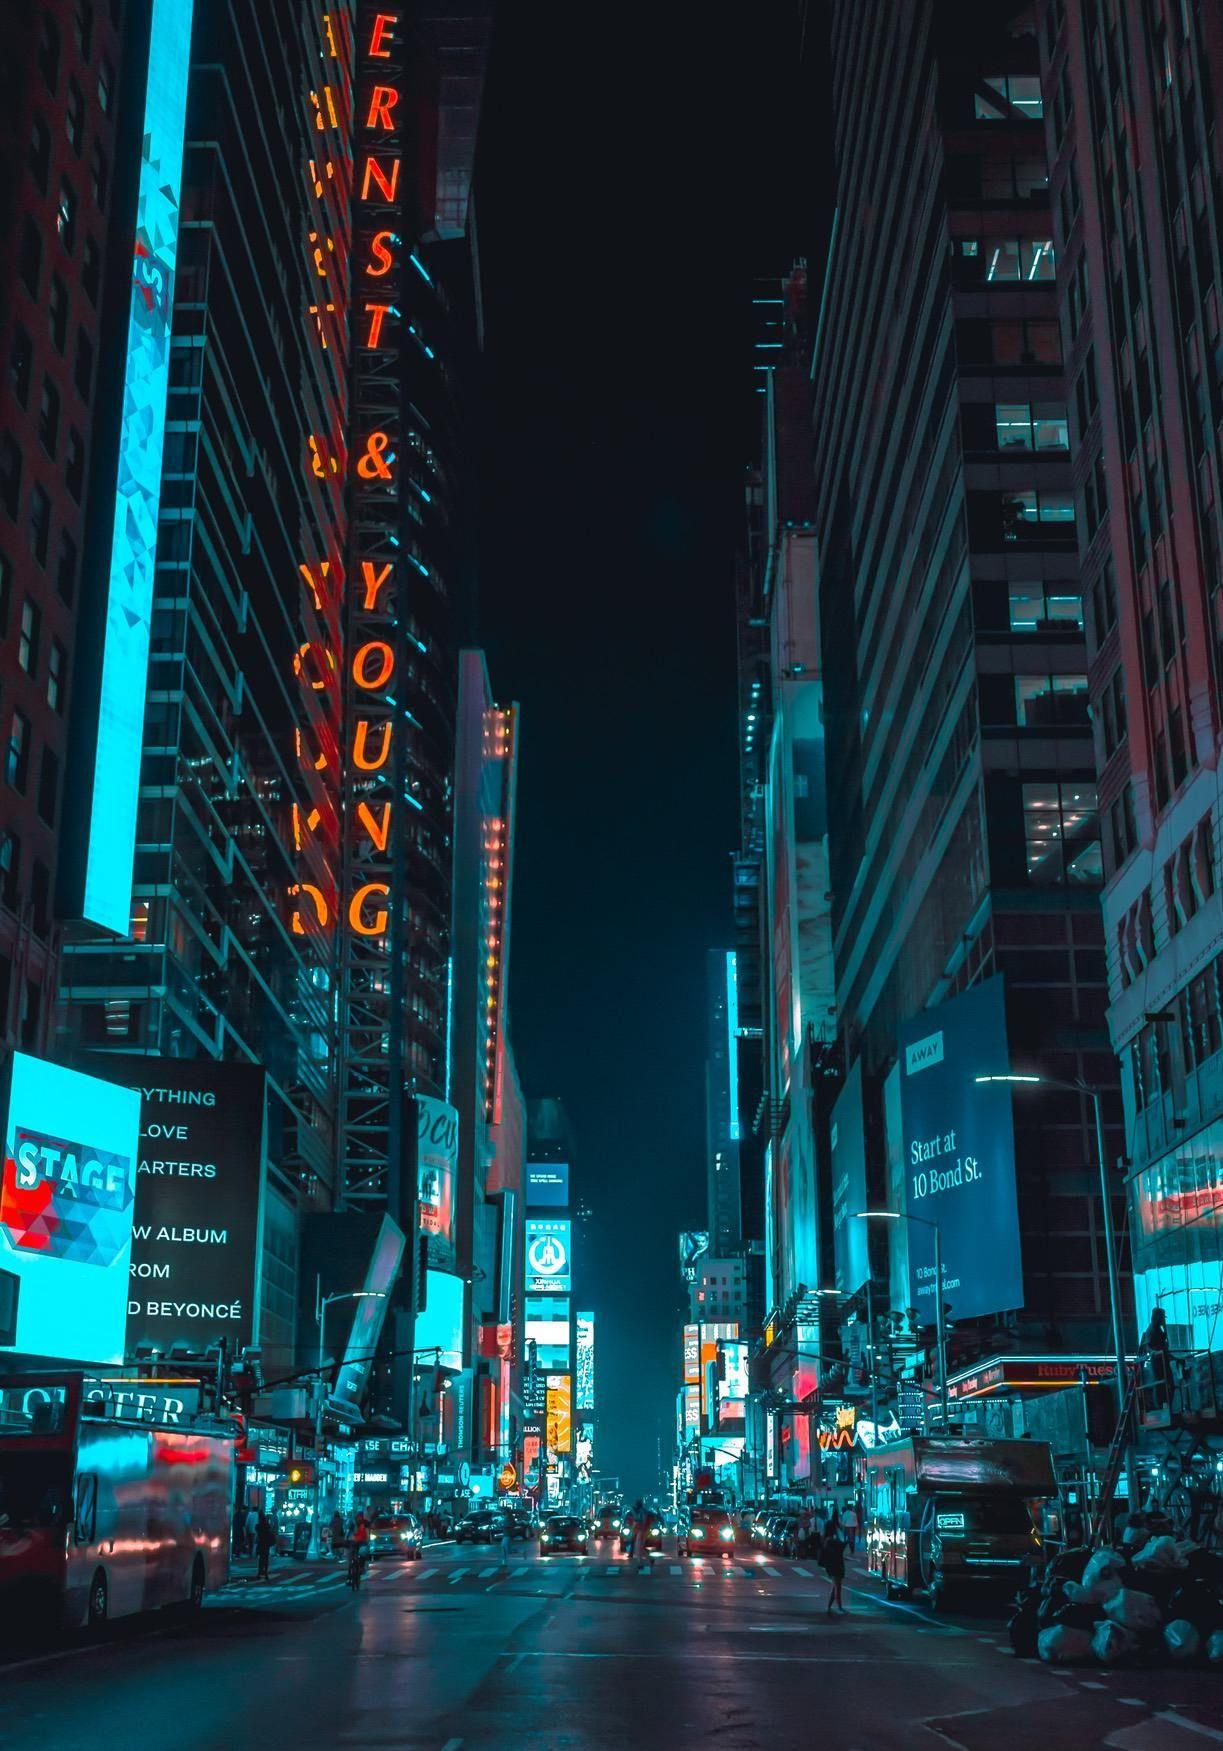 Cyberpunk Neon City Iphone Wallpaper